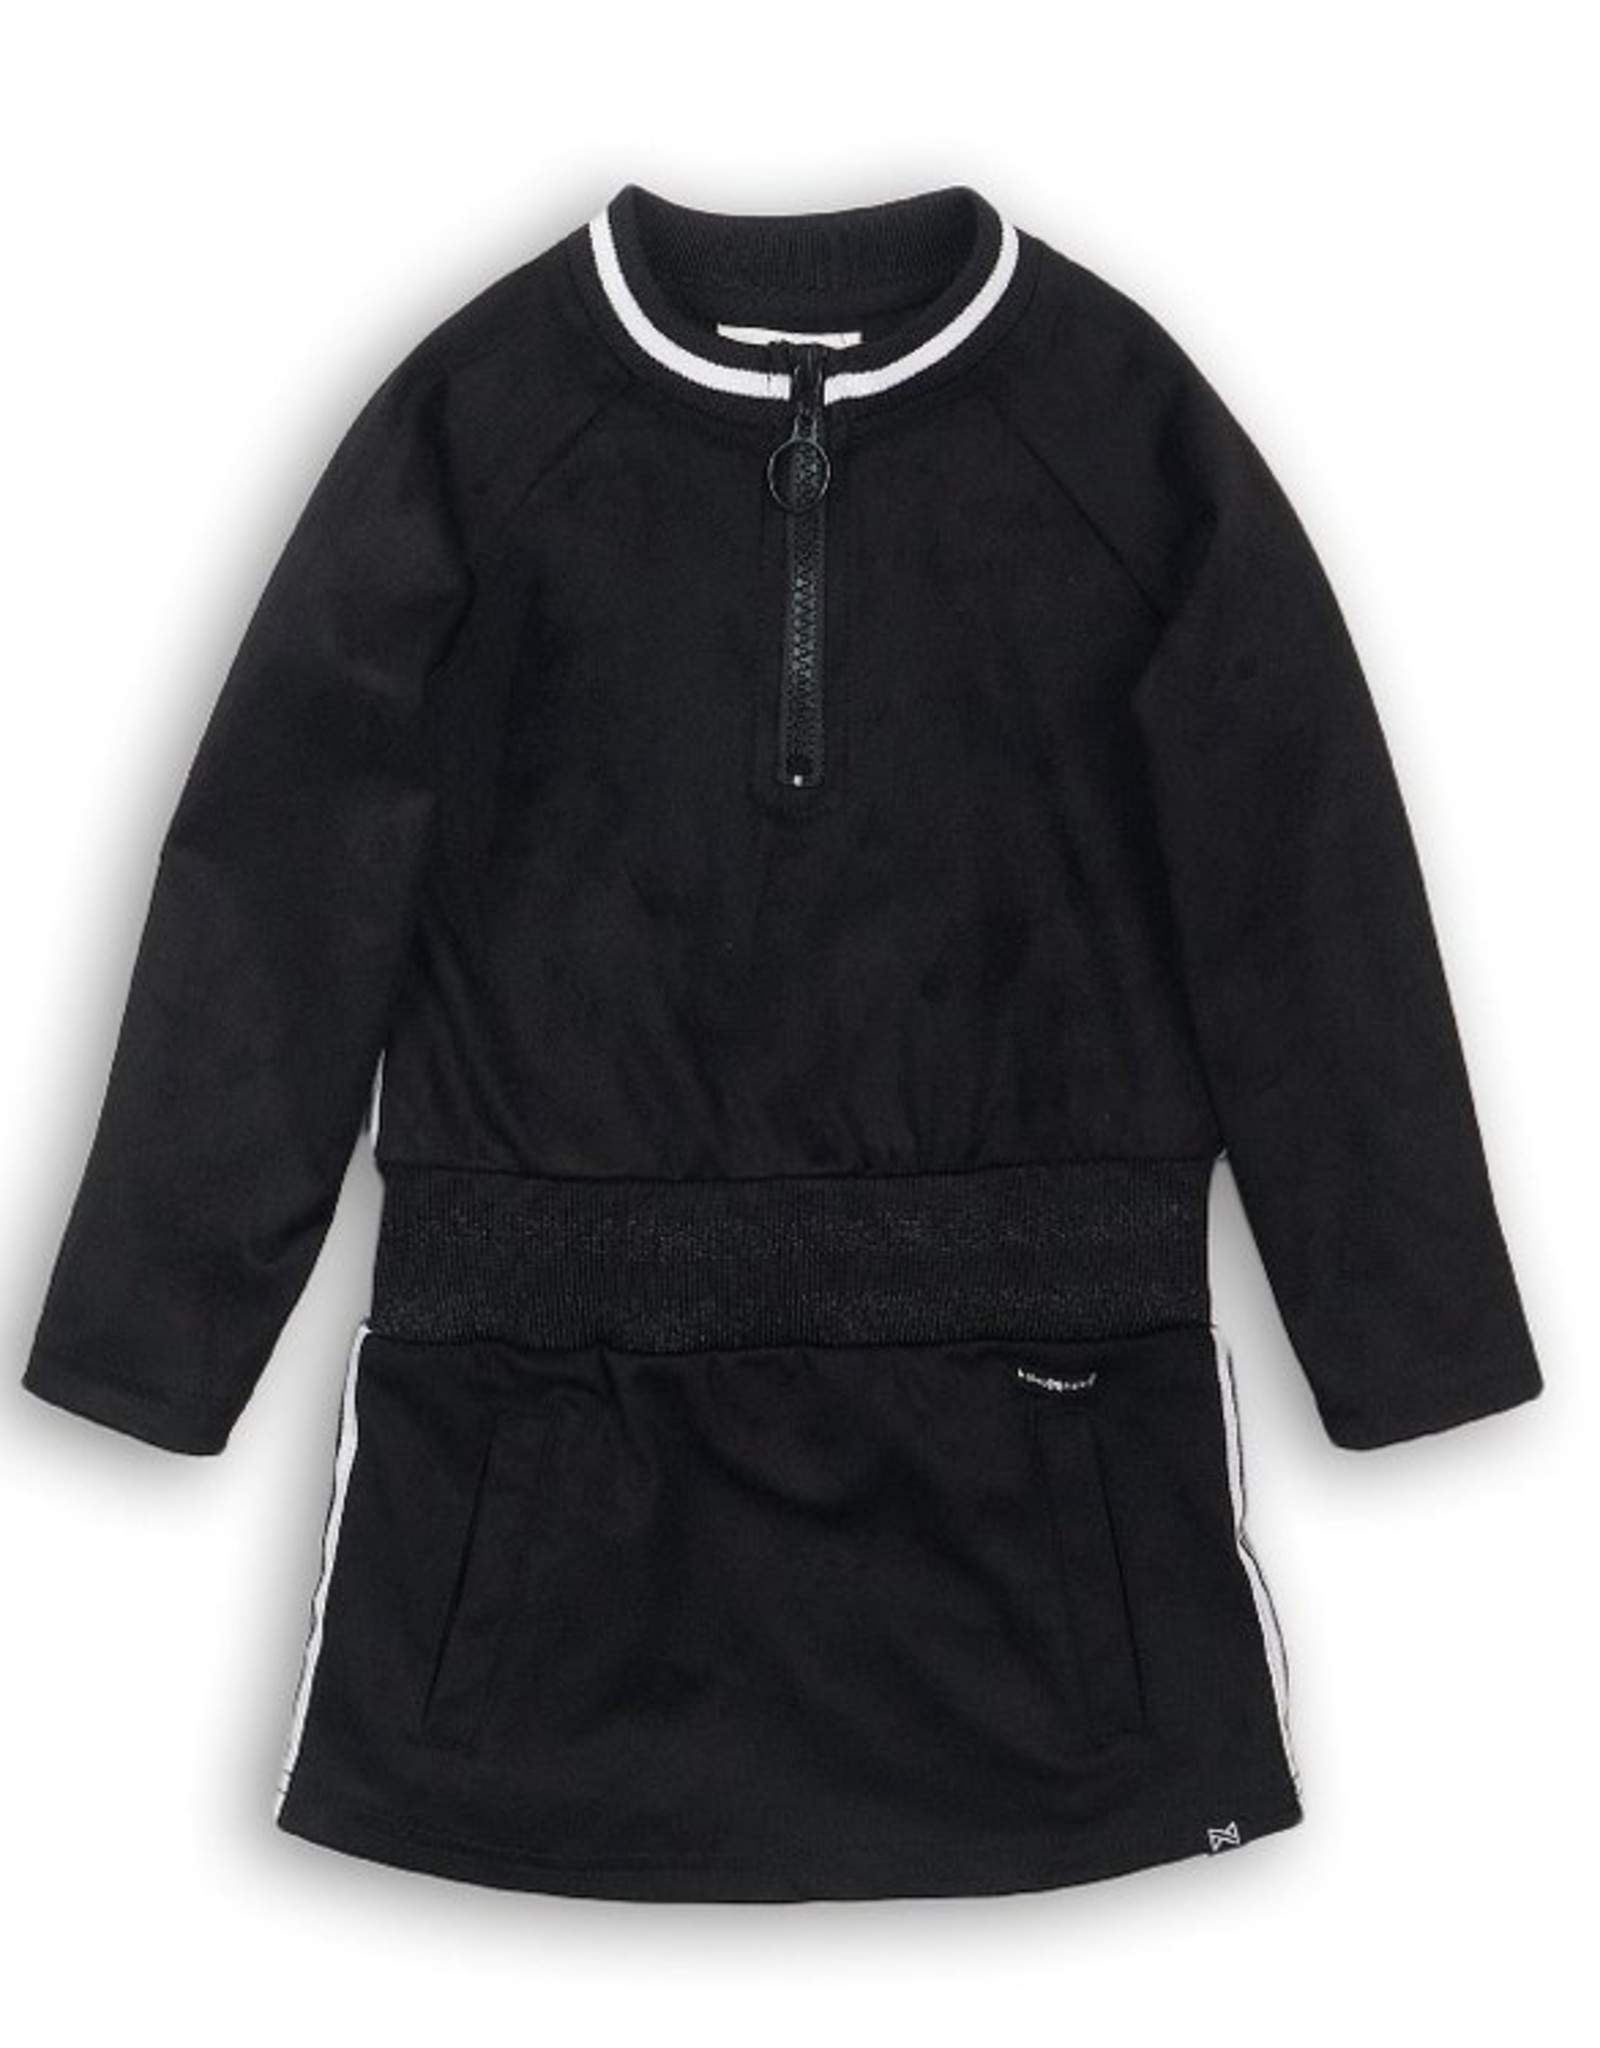 Koko Noko FA20 Black Dress w/ Zip